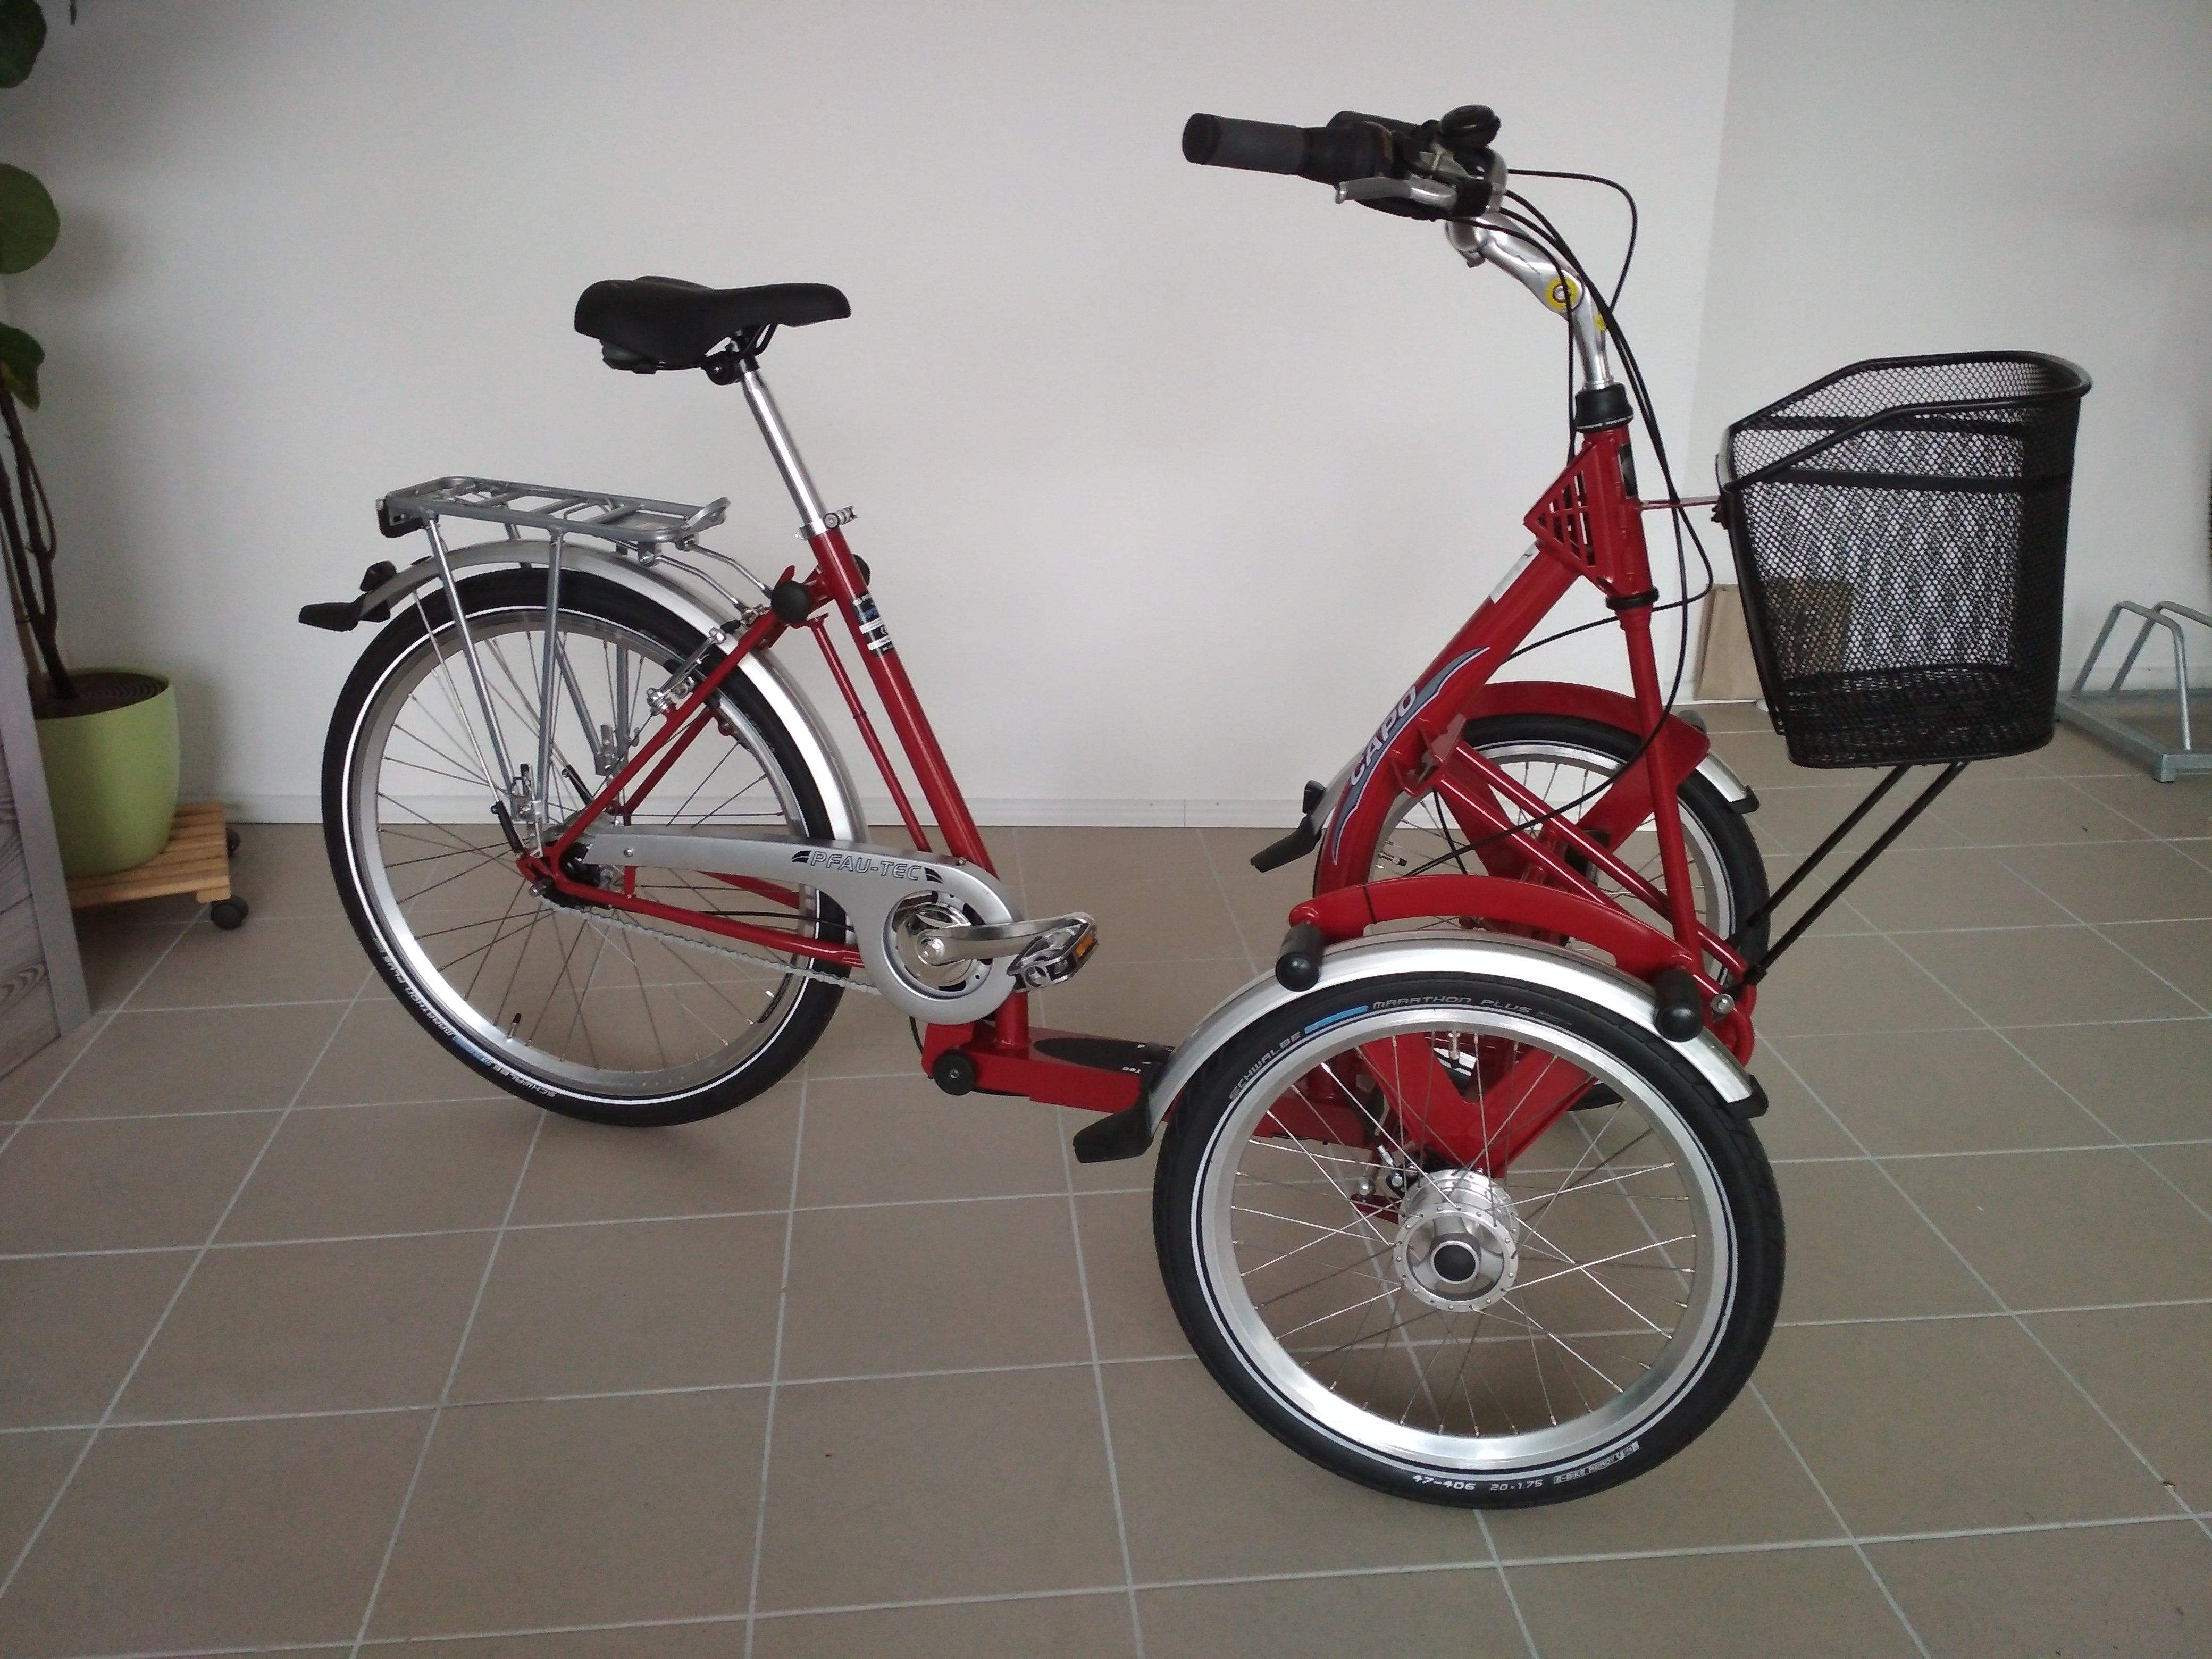 senioren dreirad capo ihr fahrradladen f r besondere e. Black Bedroom Furniture Sets. Home Design Ideas